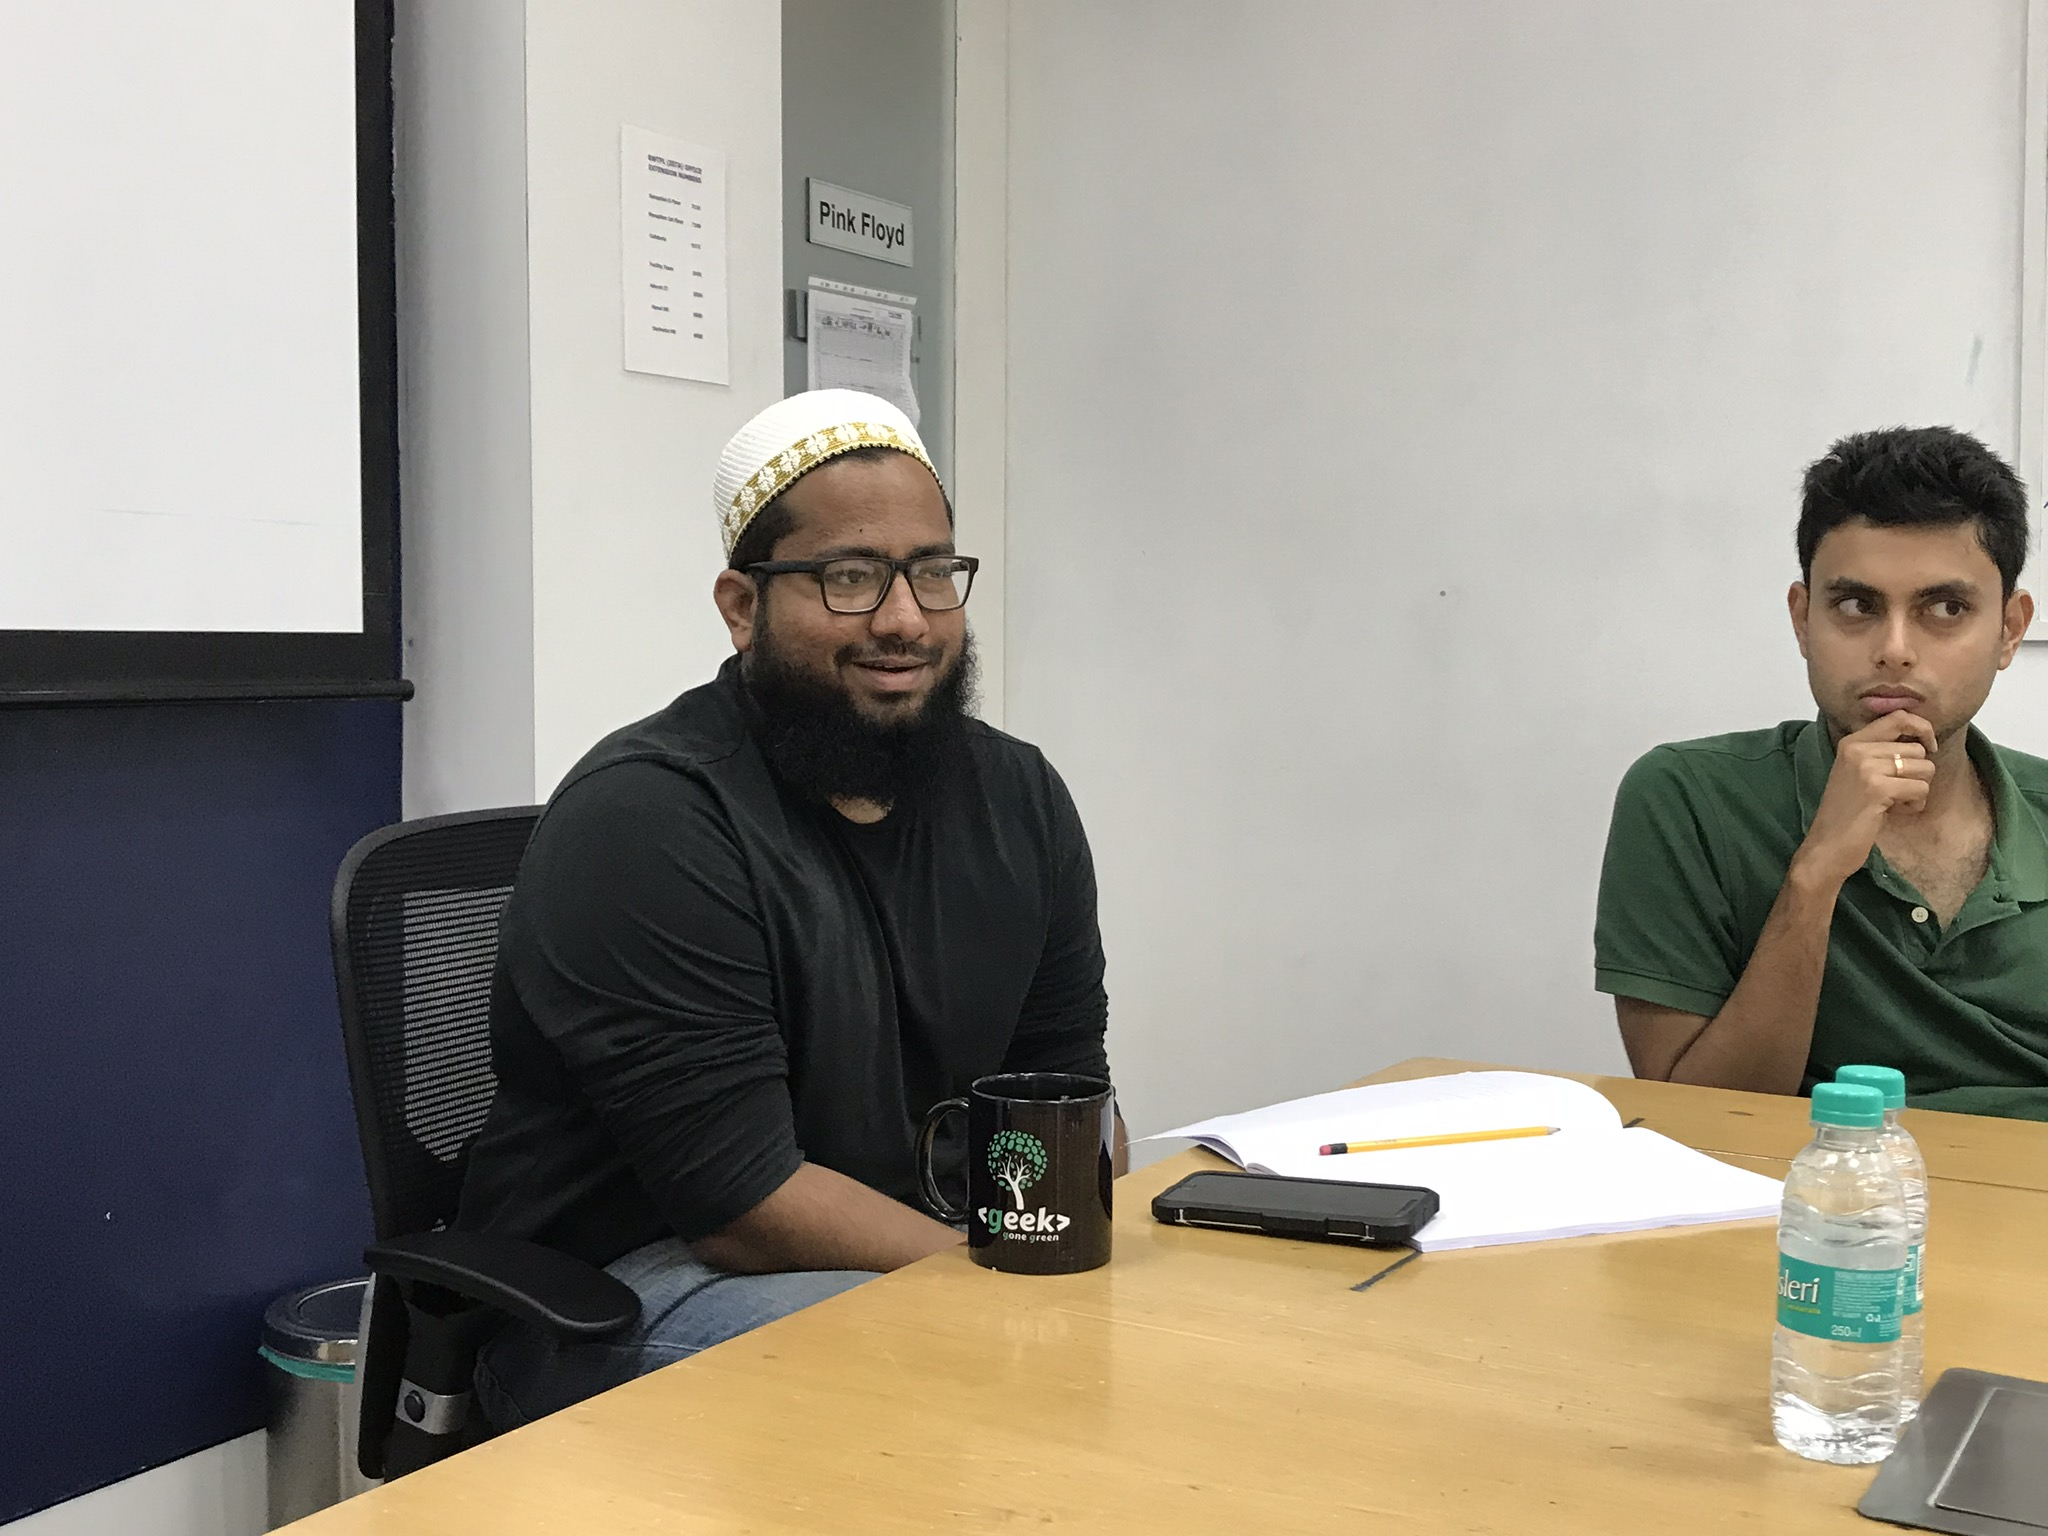 Mustafa (Left) and Kshitij (Right) explaining Zeta's design process